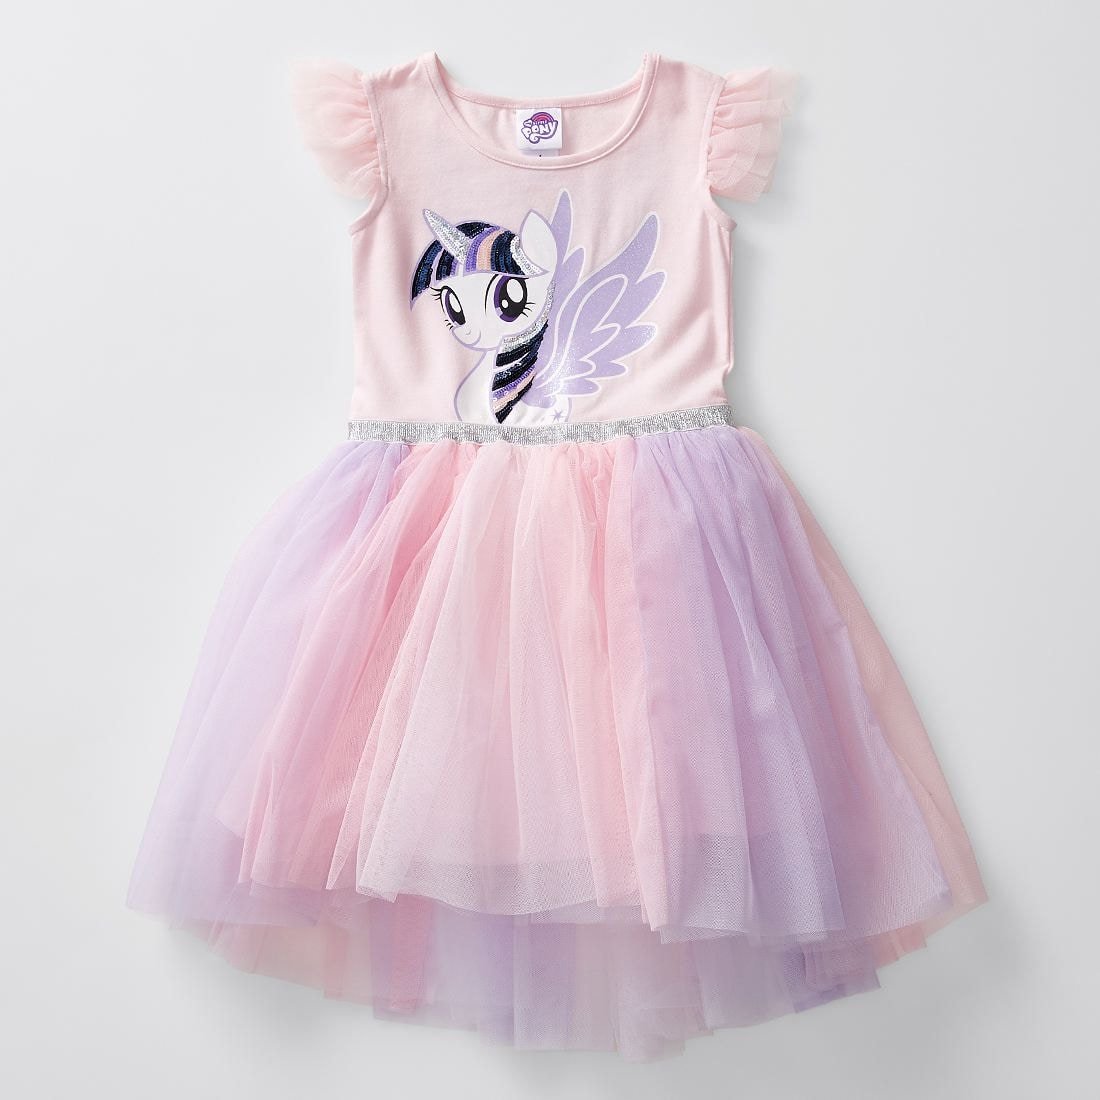 My Little Pony Tutu Dress Target Australia Roupas [ 1100 x 1100 Pixel ]